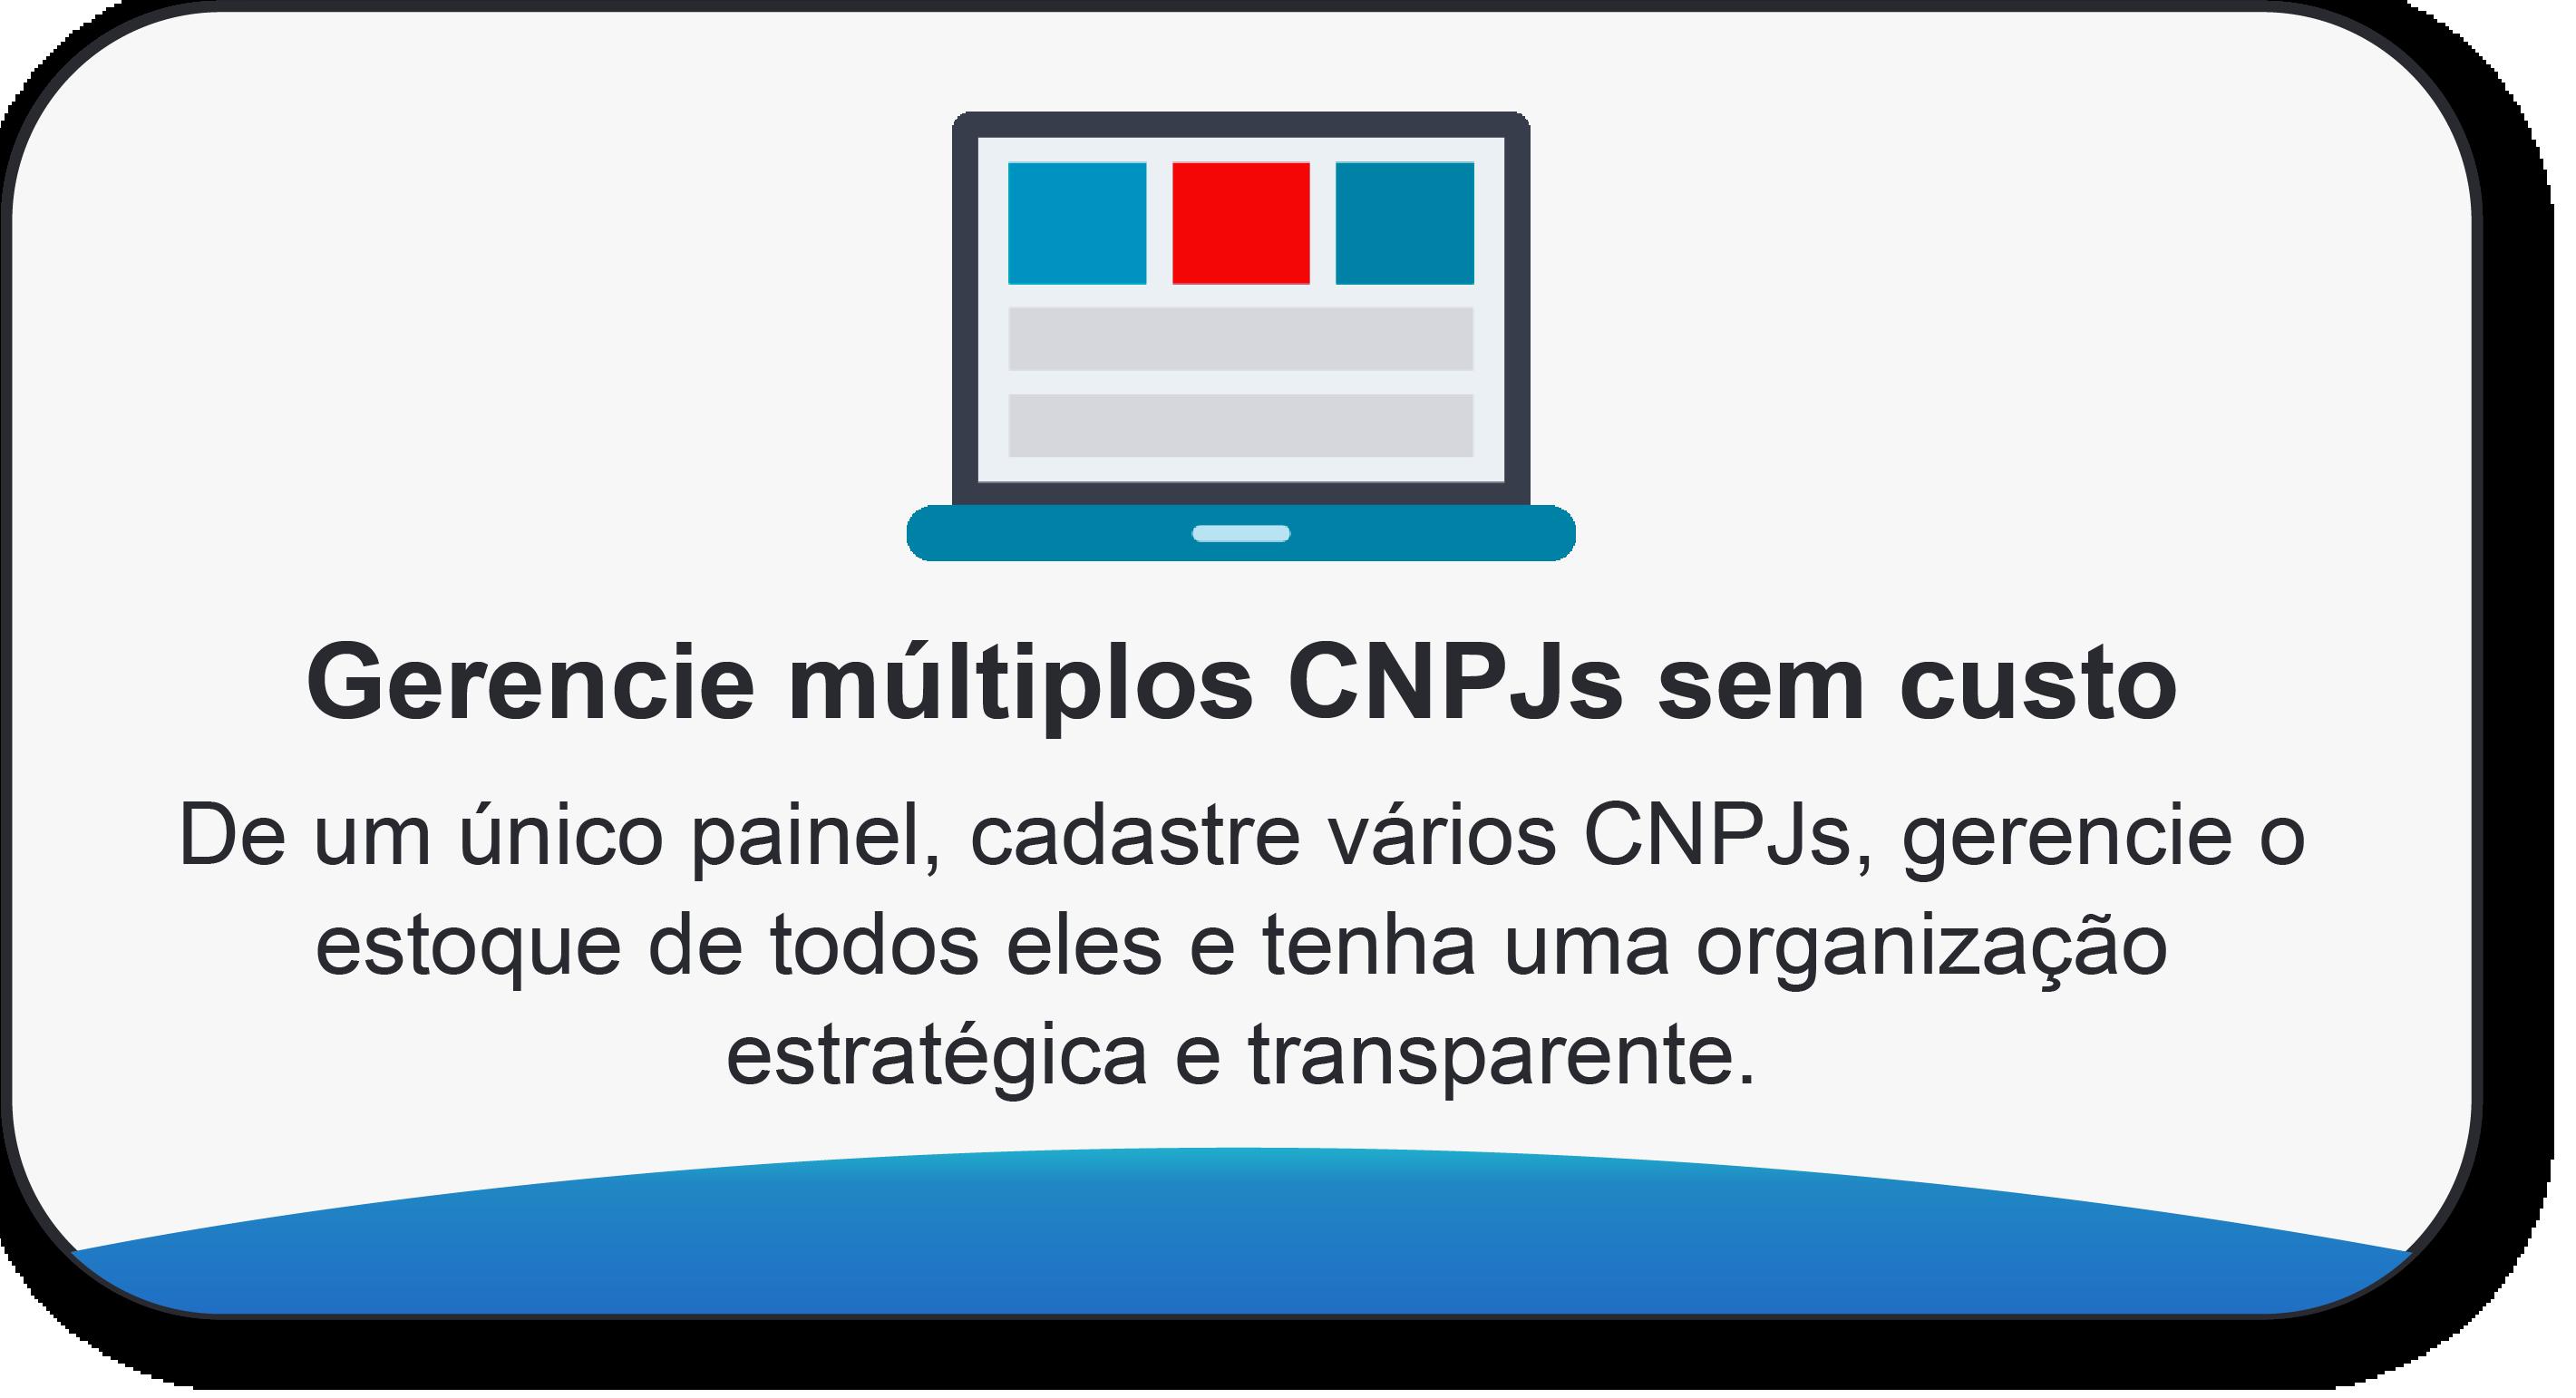 gerencie_multiplos_cnpjs_com_magis5